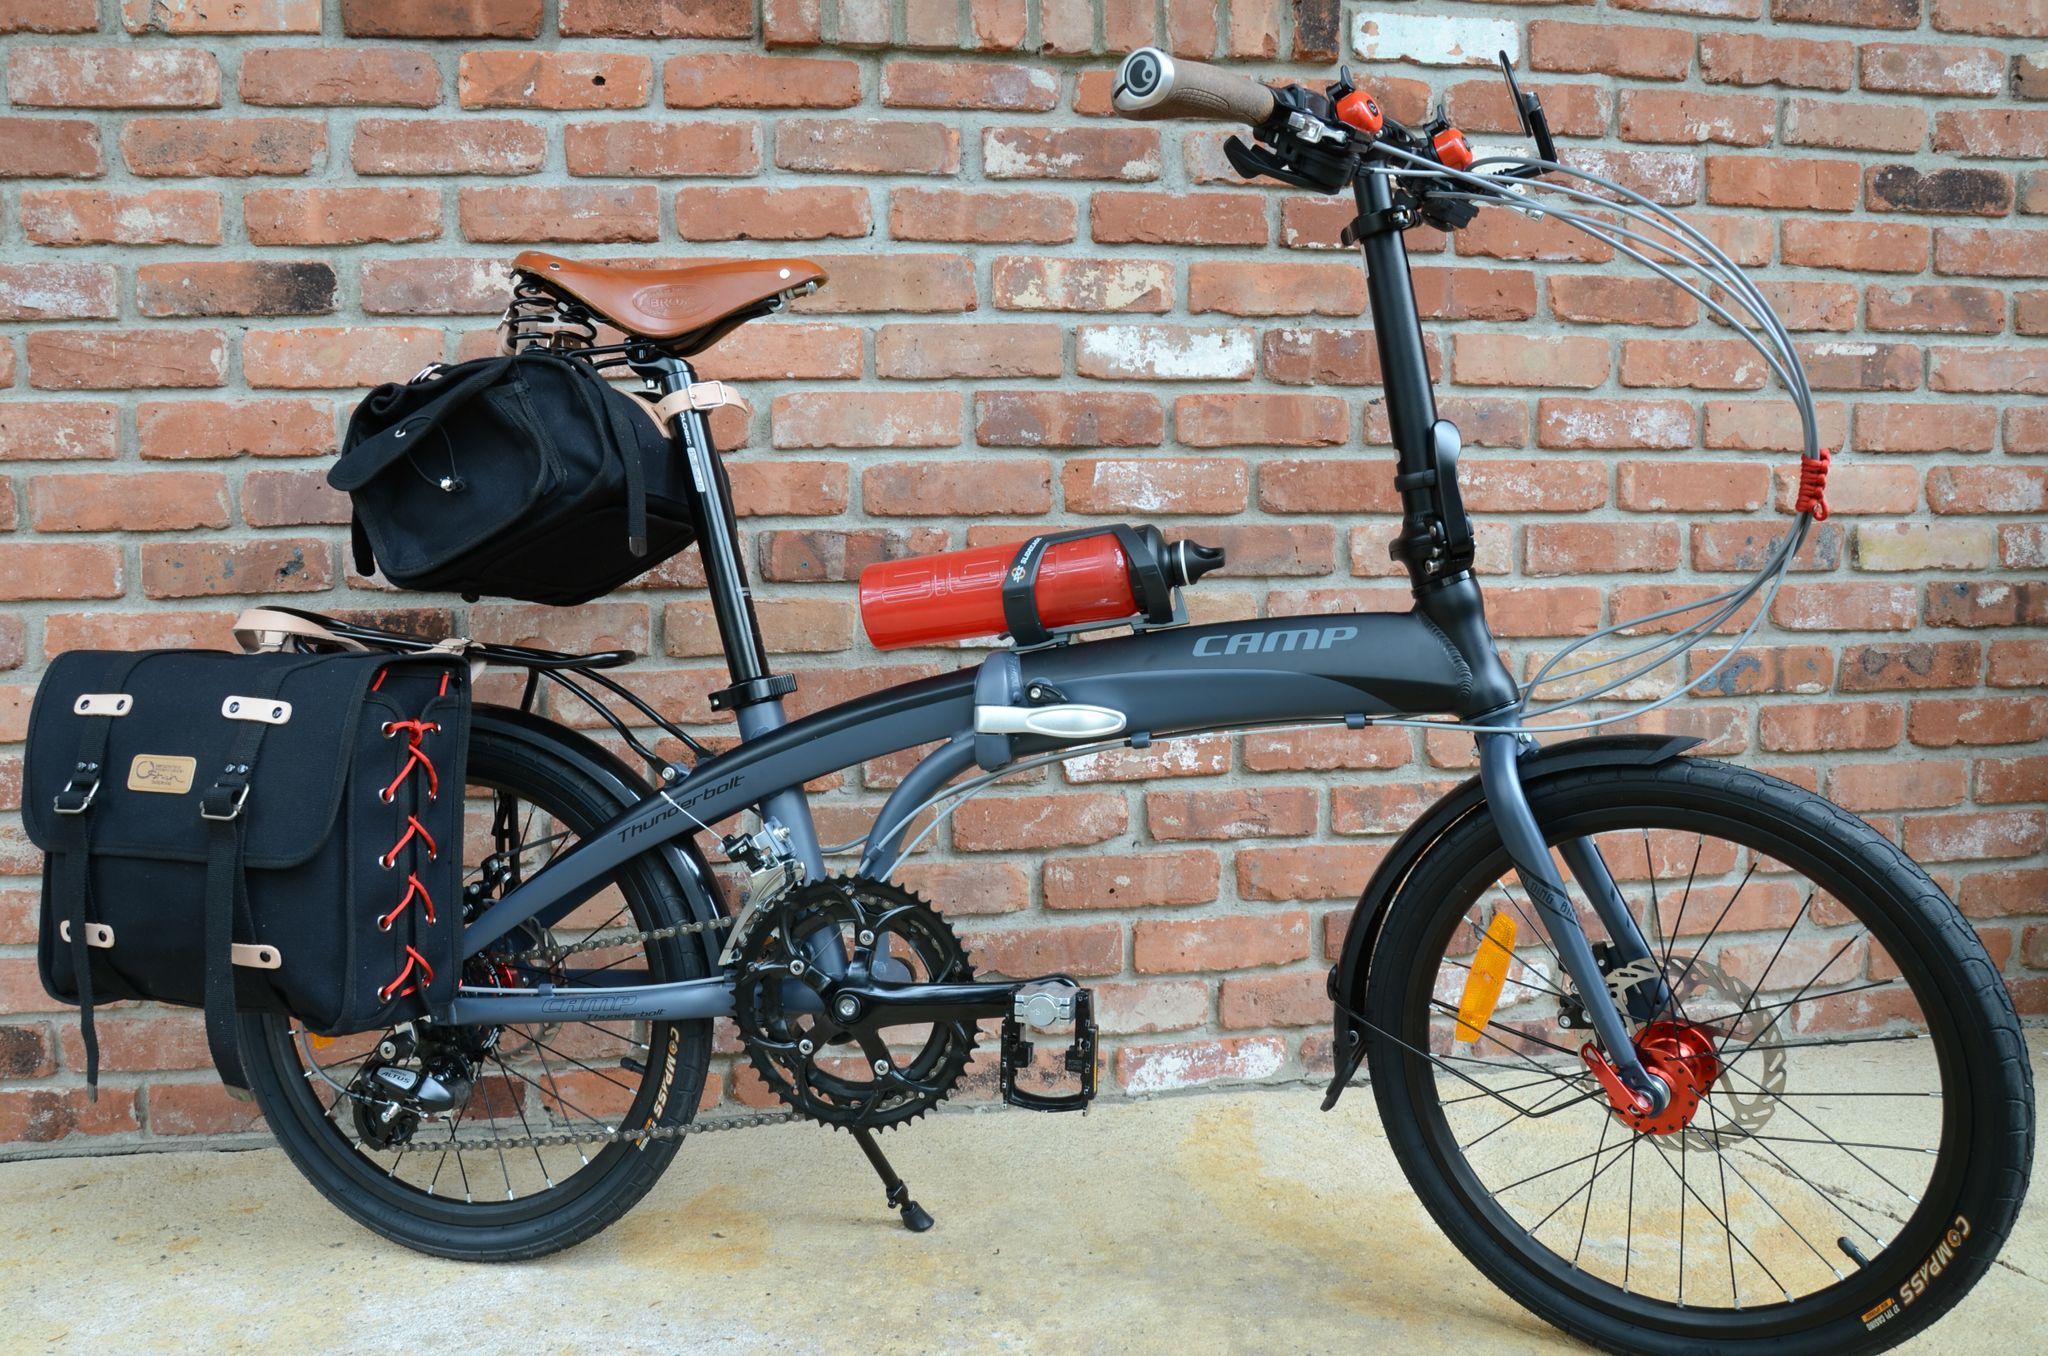 Camp Thunderbolt Folding Bike Ostrich Pannier Bag And